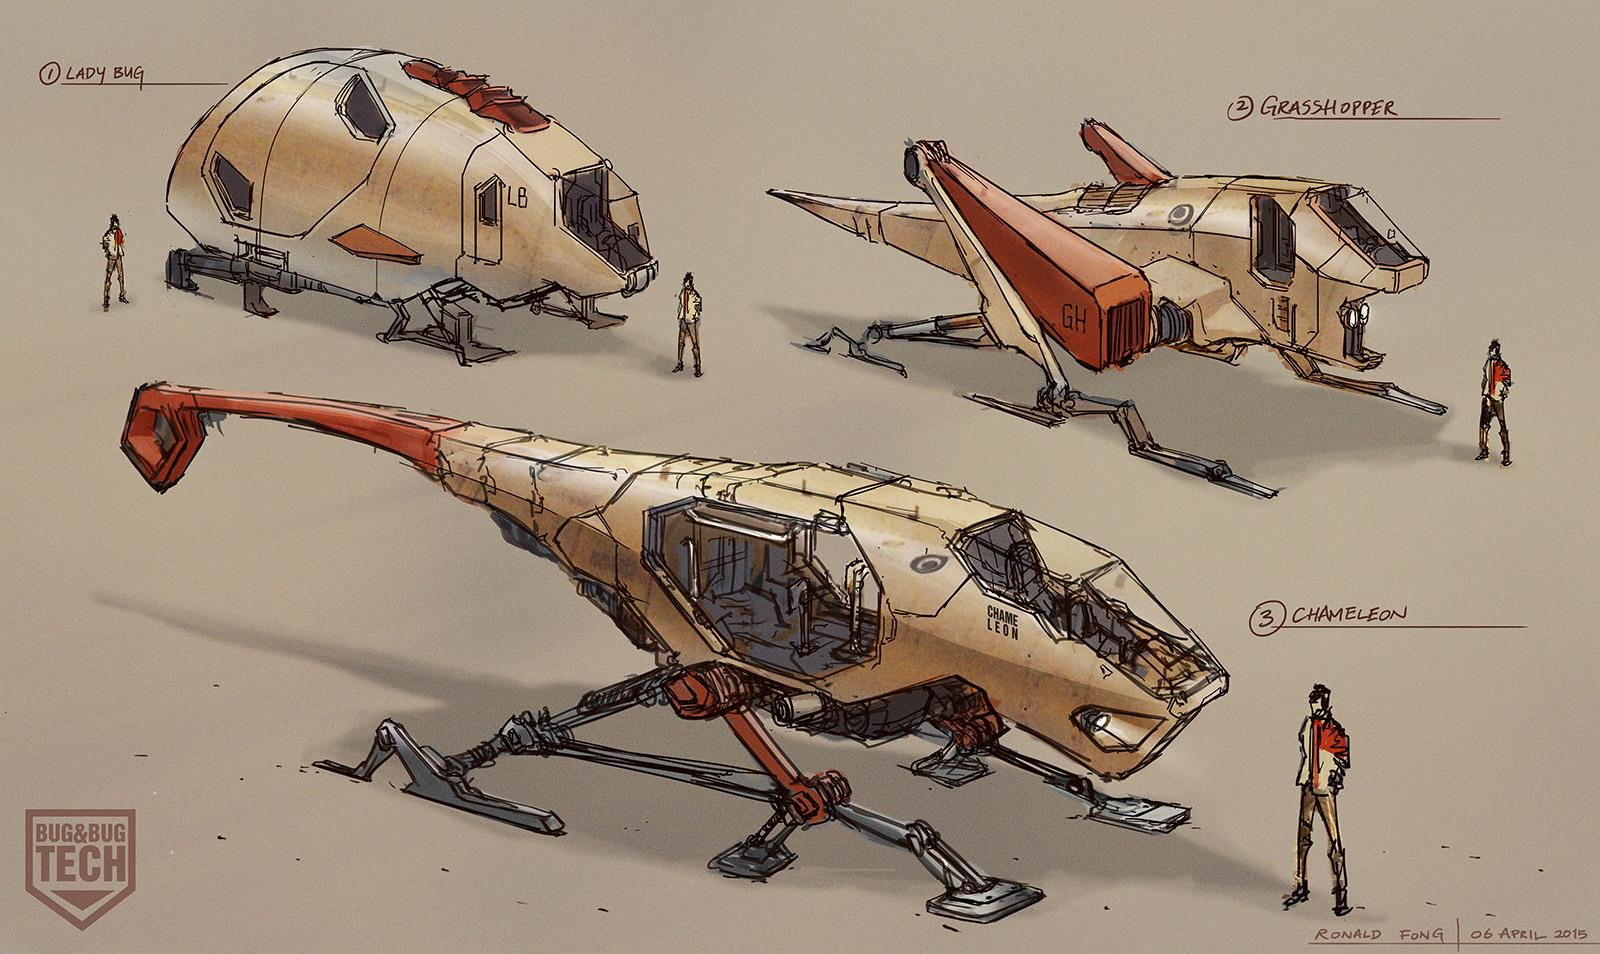 Ronald Fong Bug Vehicle Concept Art